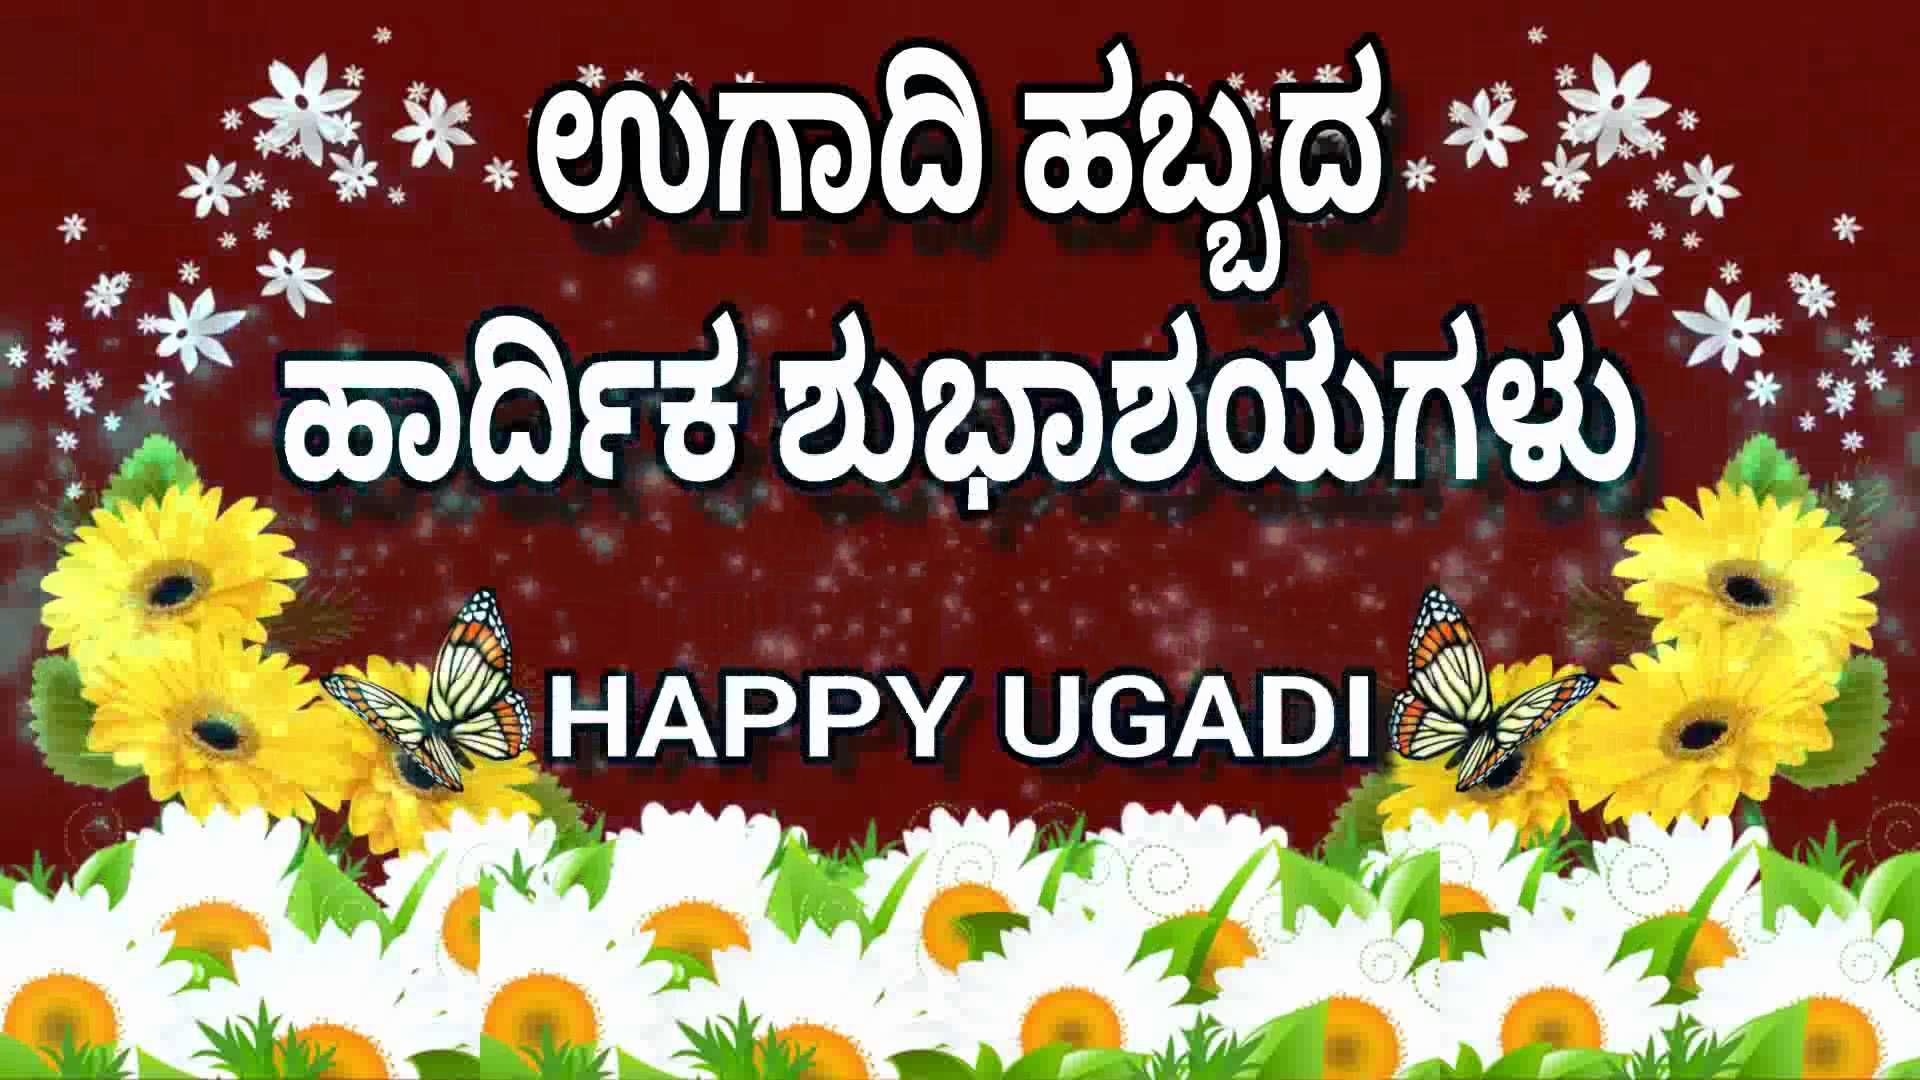 Happy ugadi greetings in kannada ugadi kannada whatsapp